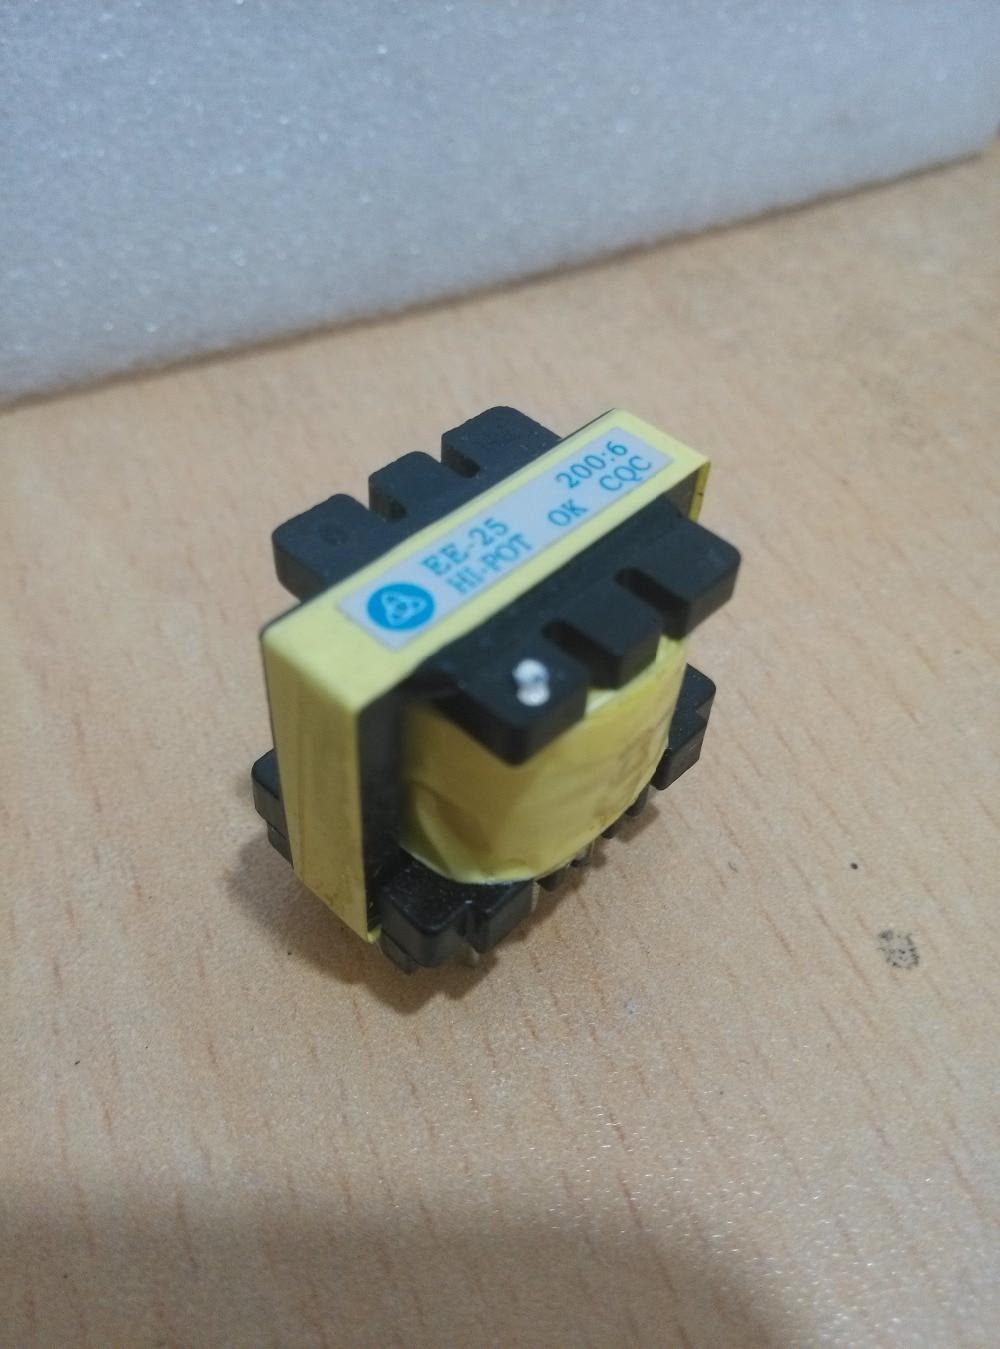 1pcs ee25 200 6 welding transformer high frequency switch power supply transformer x0098 [ 1000 x 1349 Pixel ]